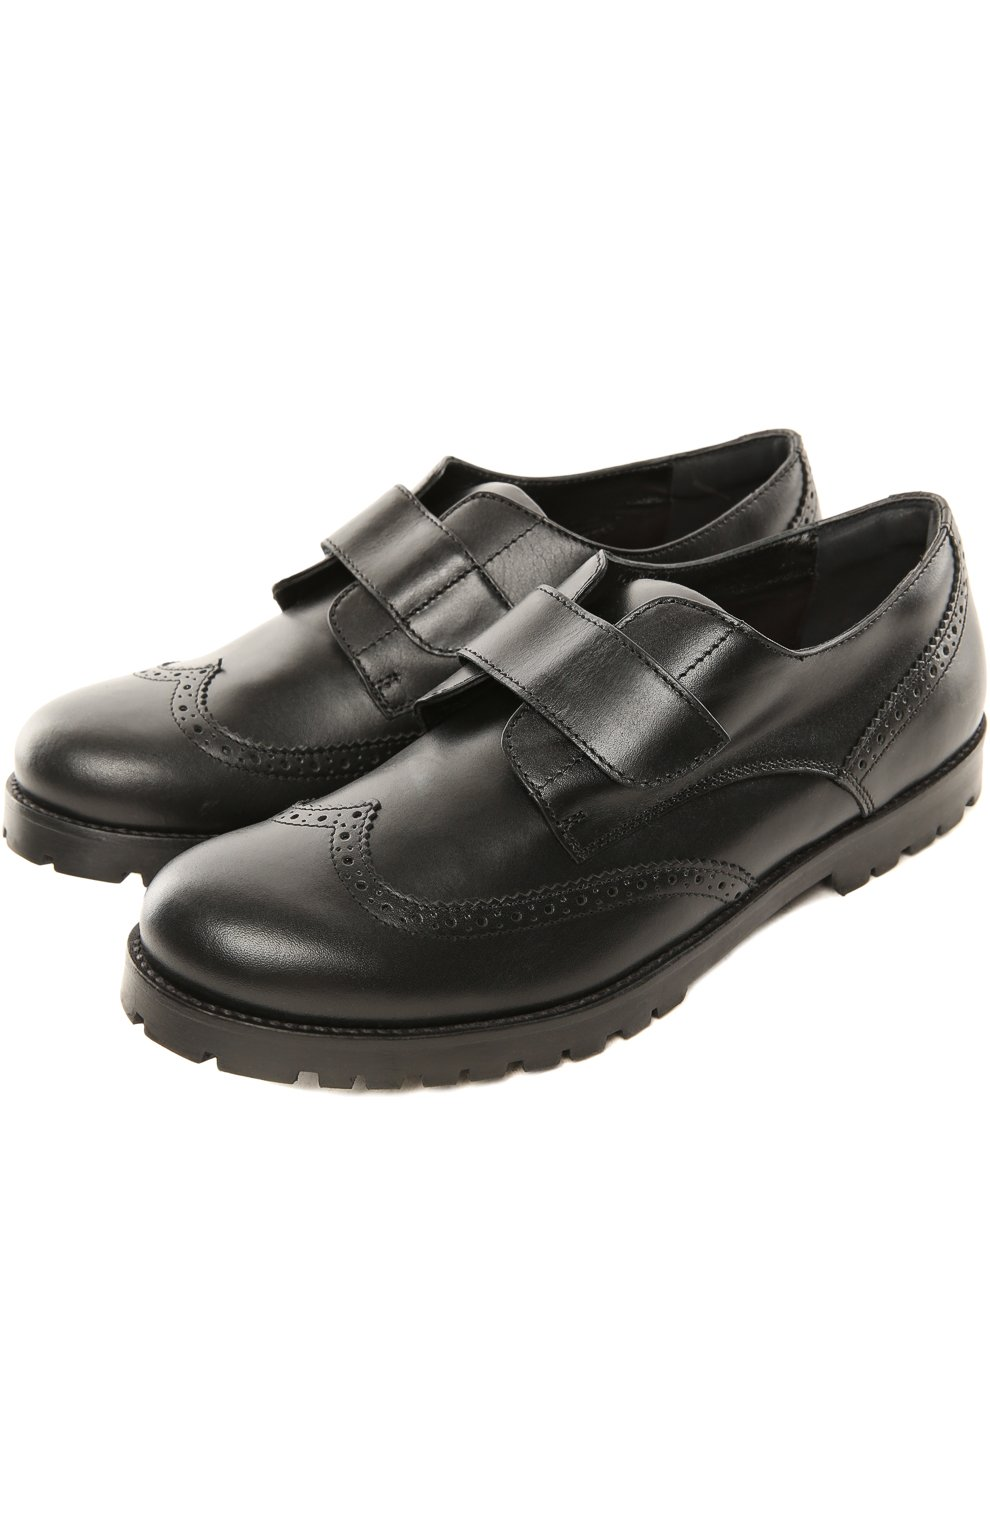 Ботинки | Фото №2